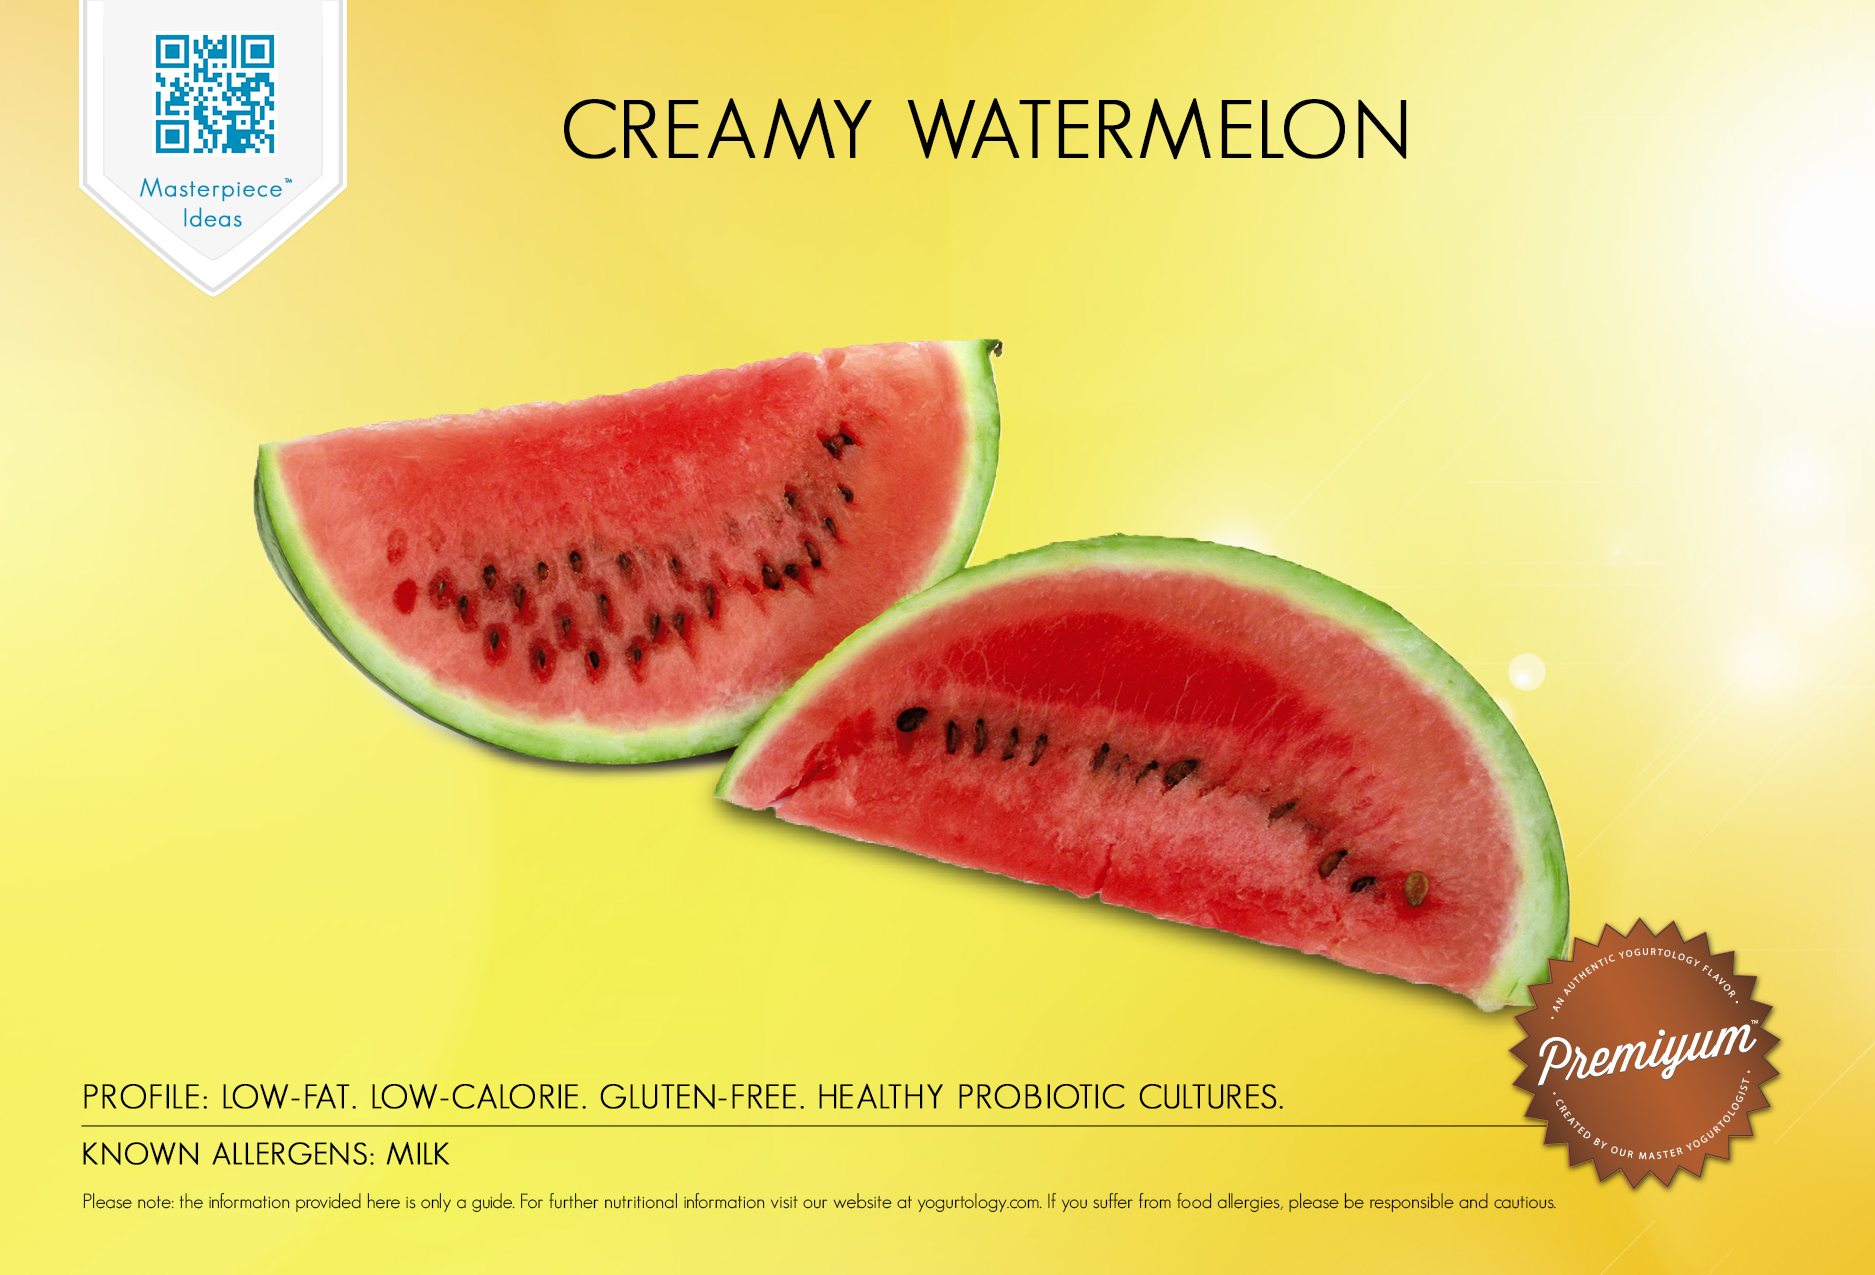 Creamy Watermelon